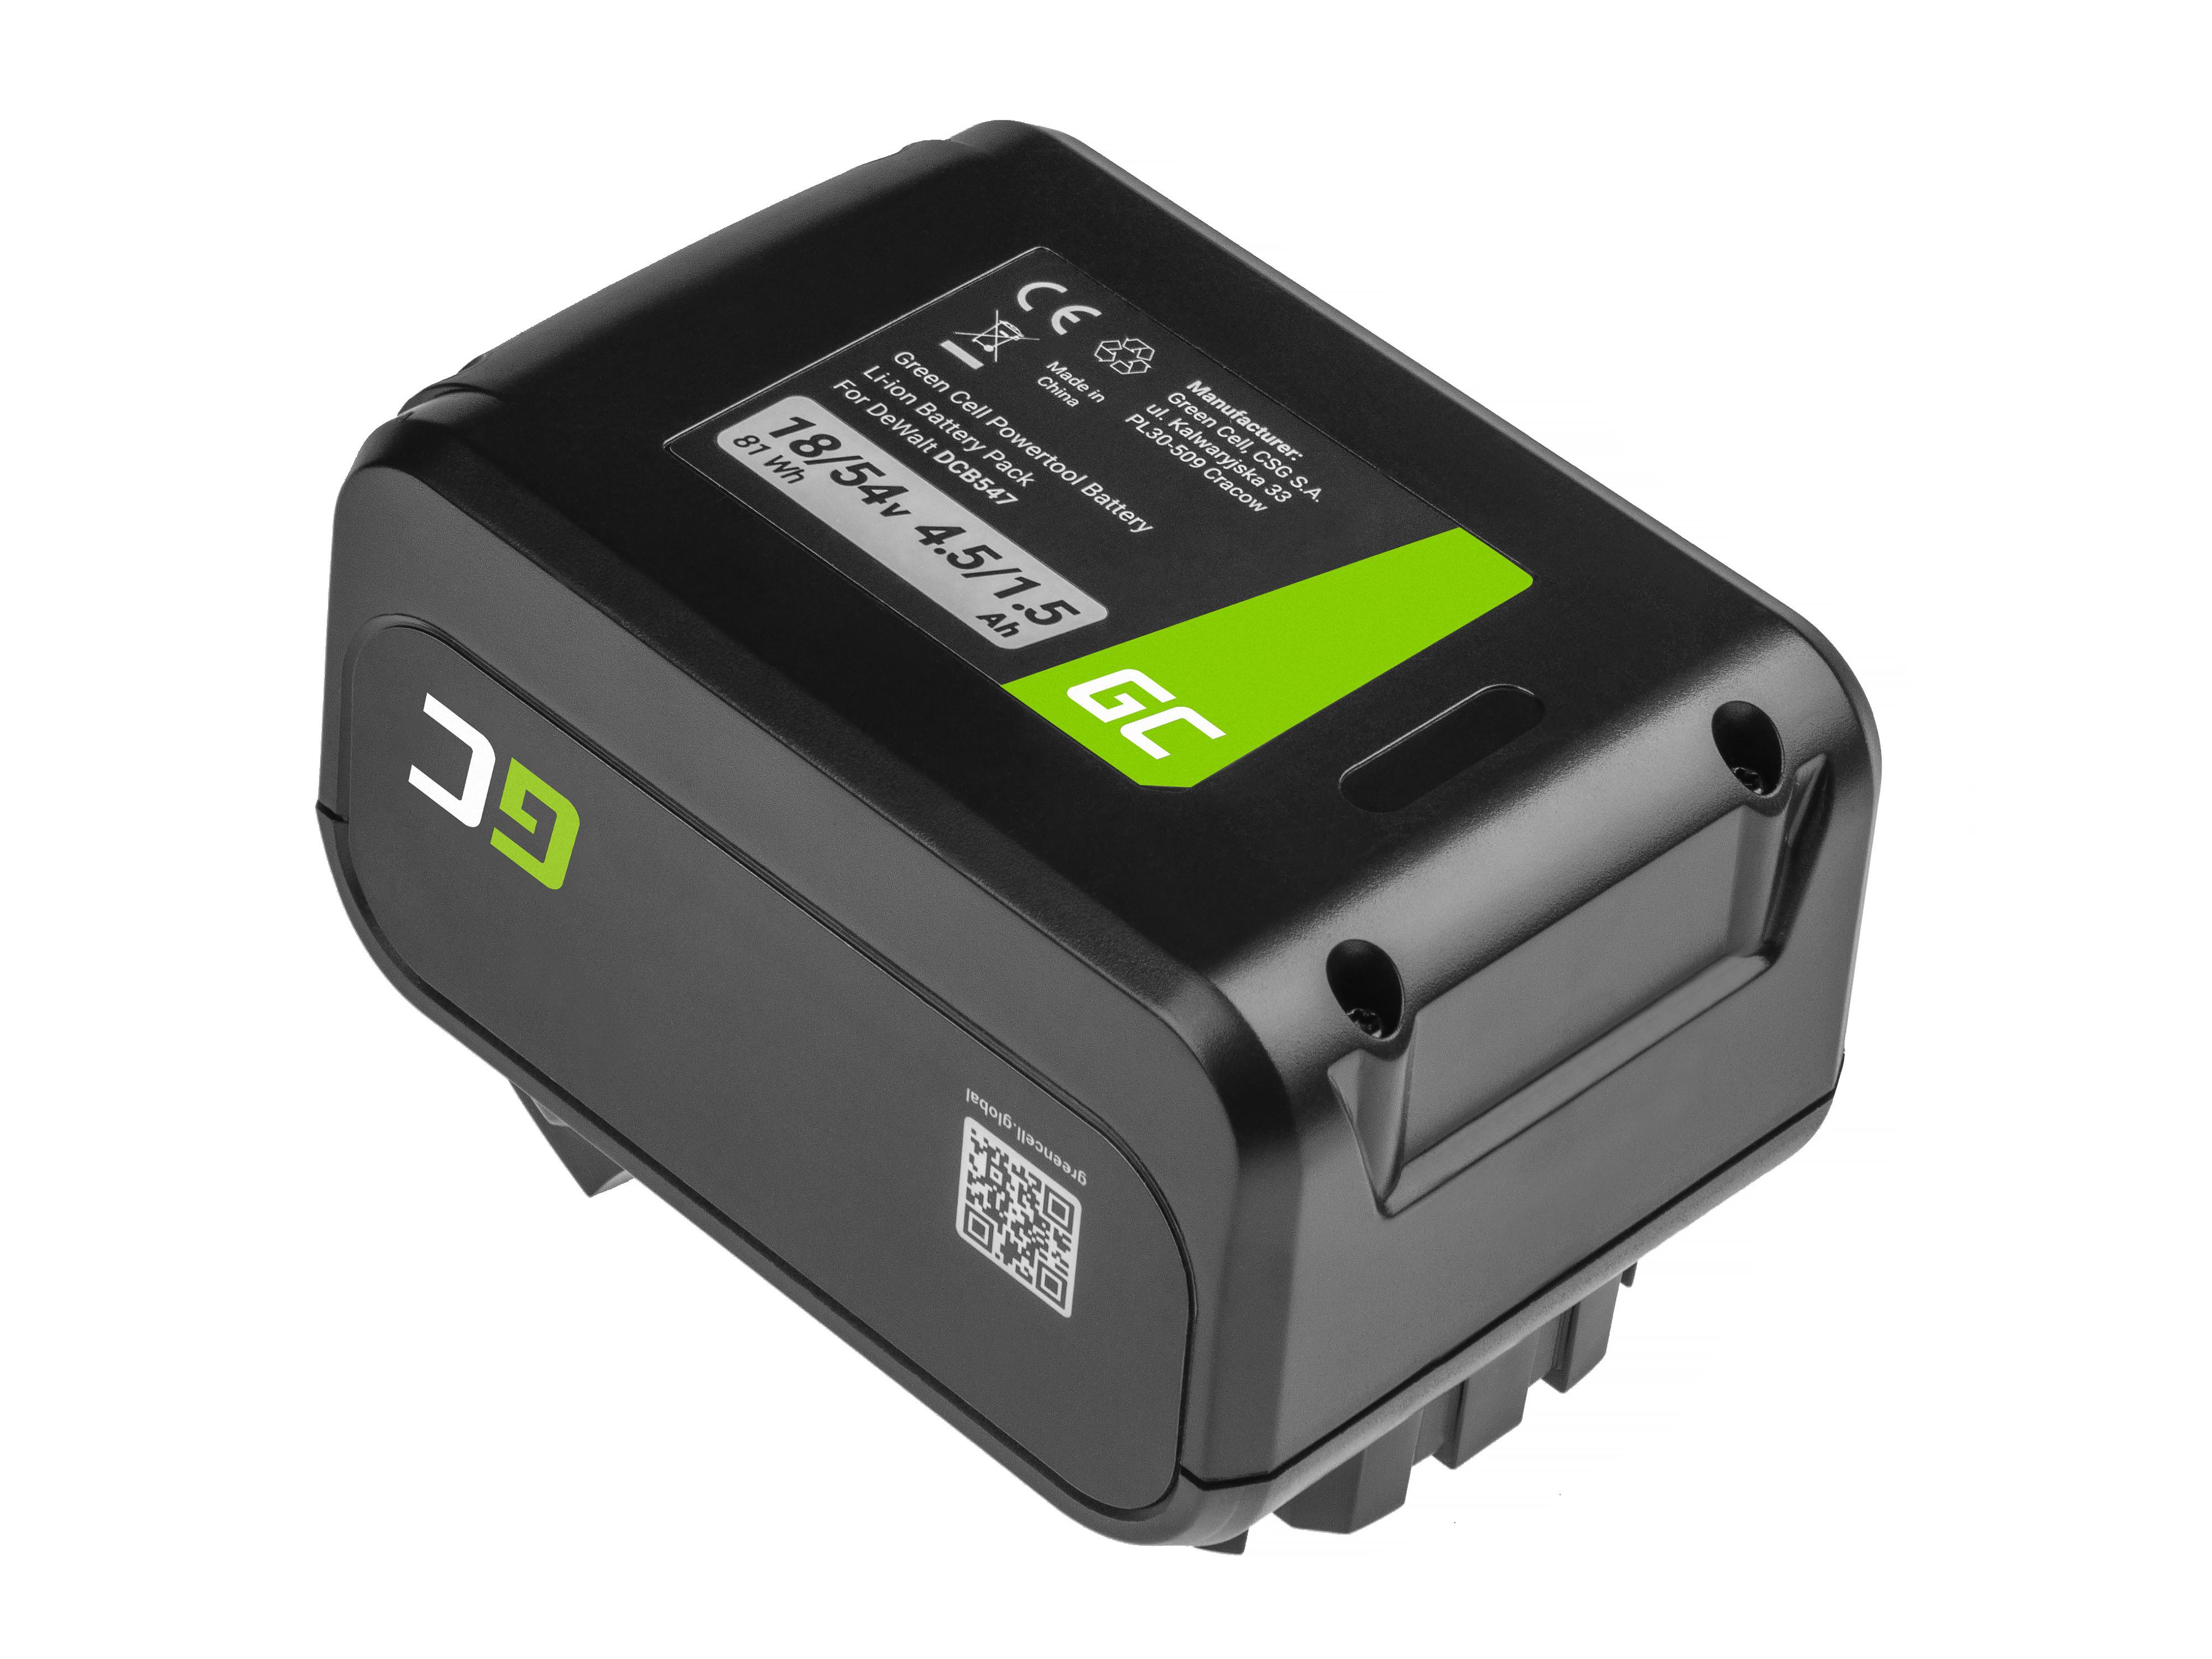 Green Cell Baterie PS130 DE9072 PS12VK pro Black & Decker FS12 DeWalt 2802K DC740KA